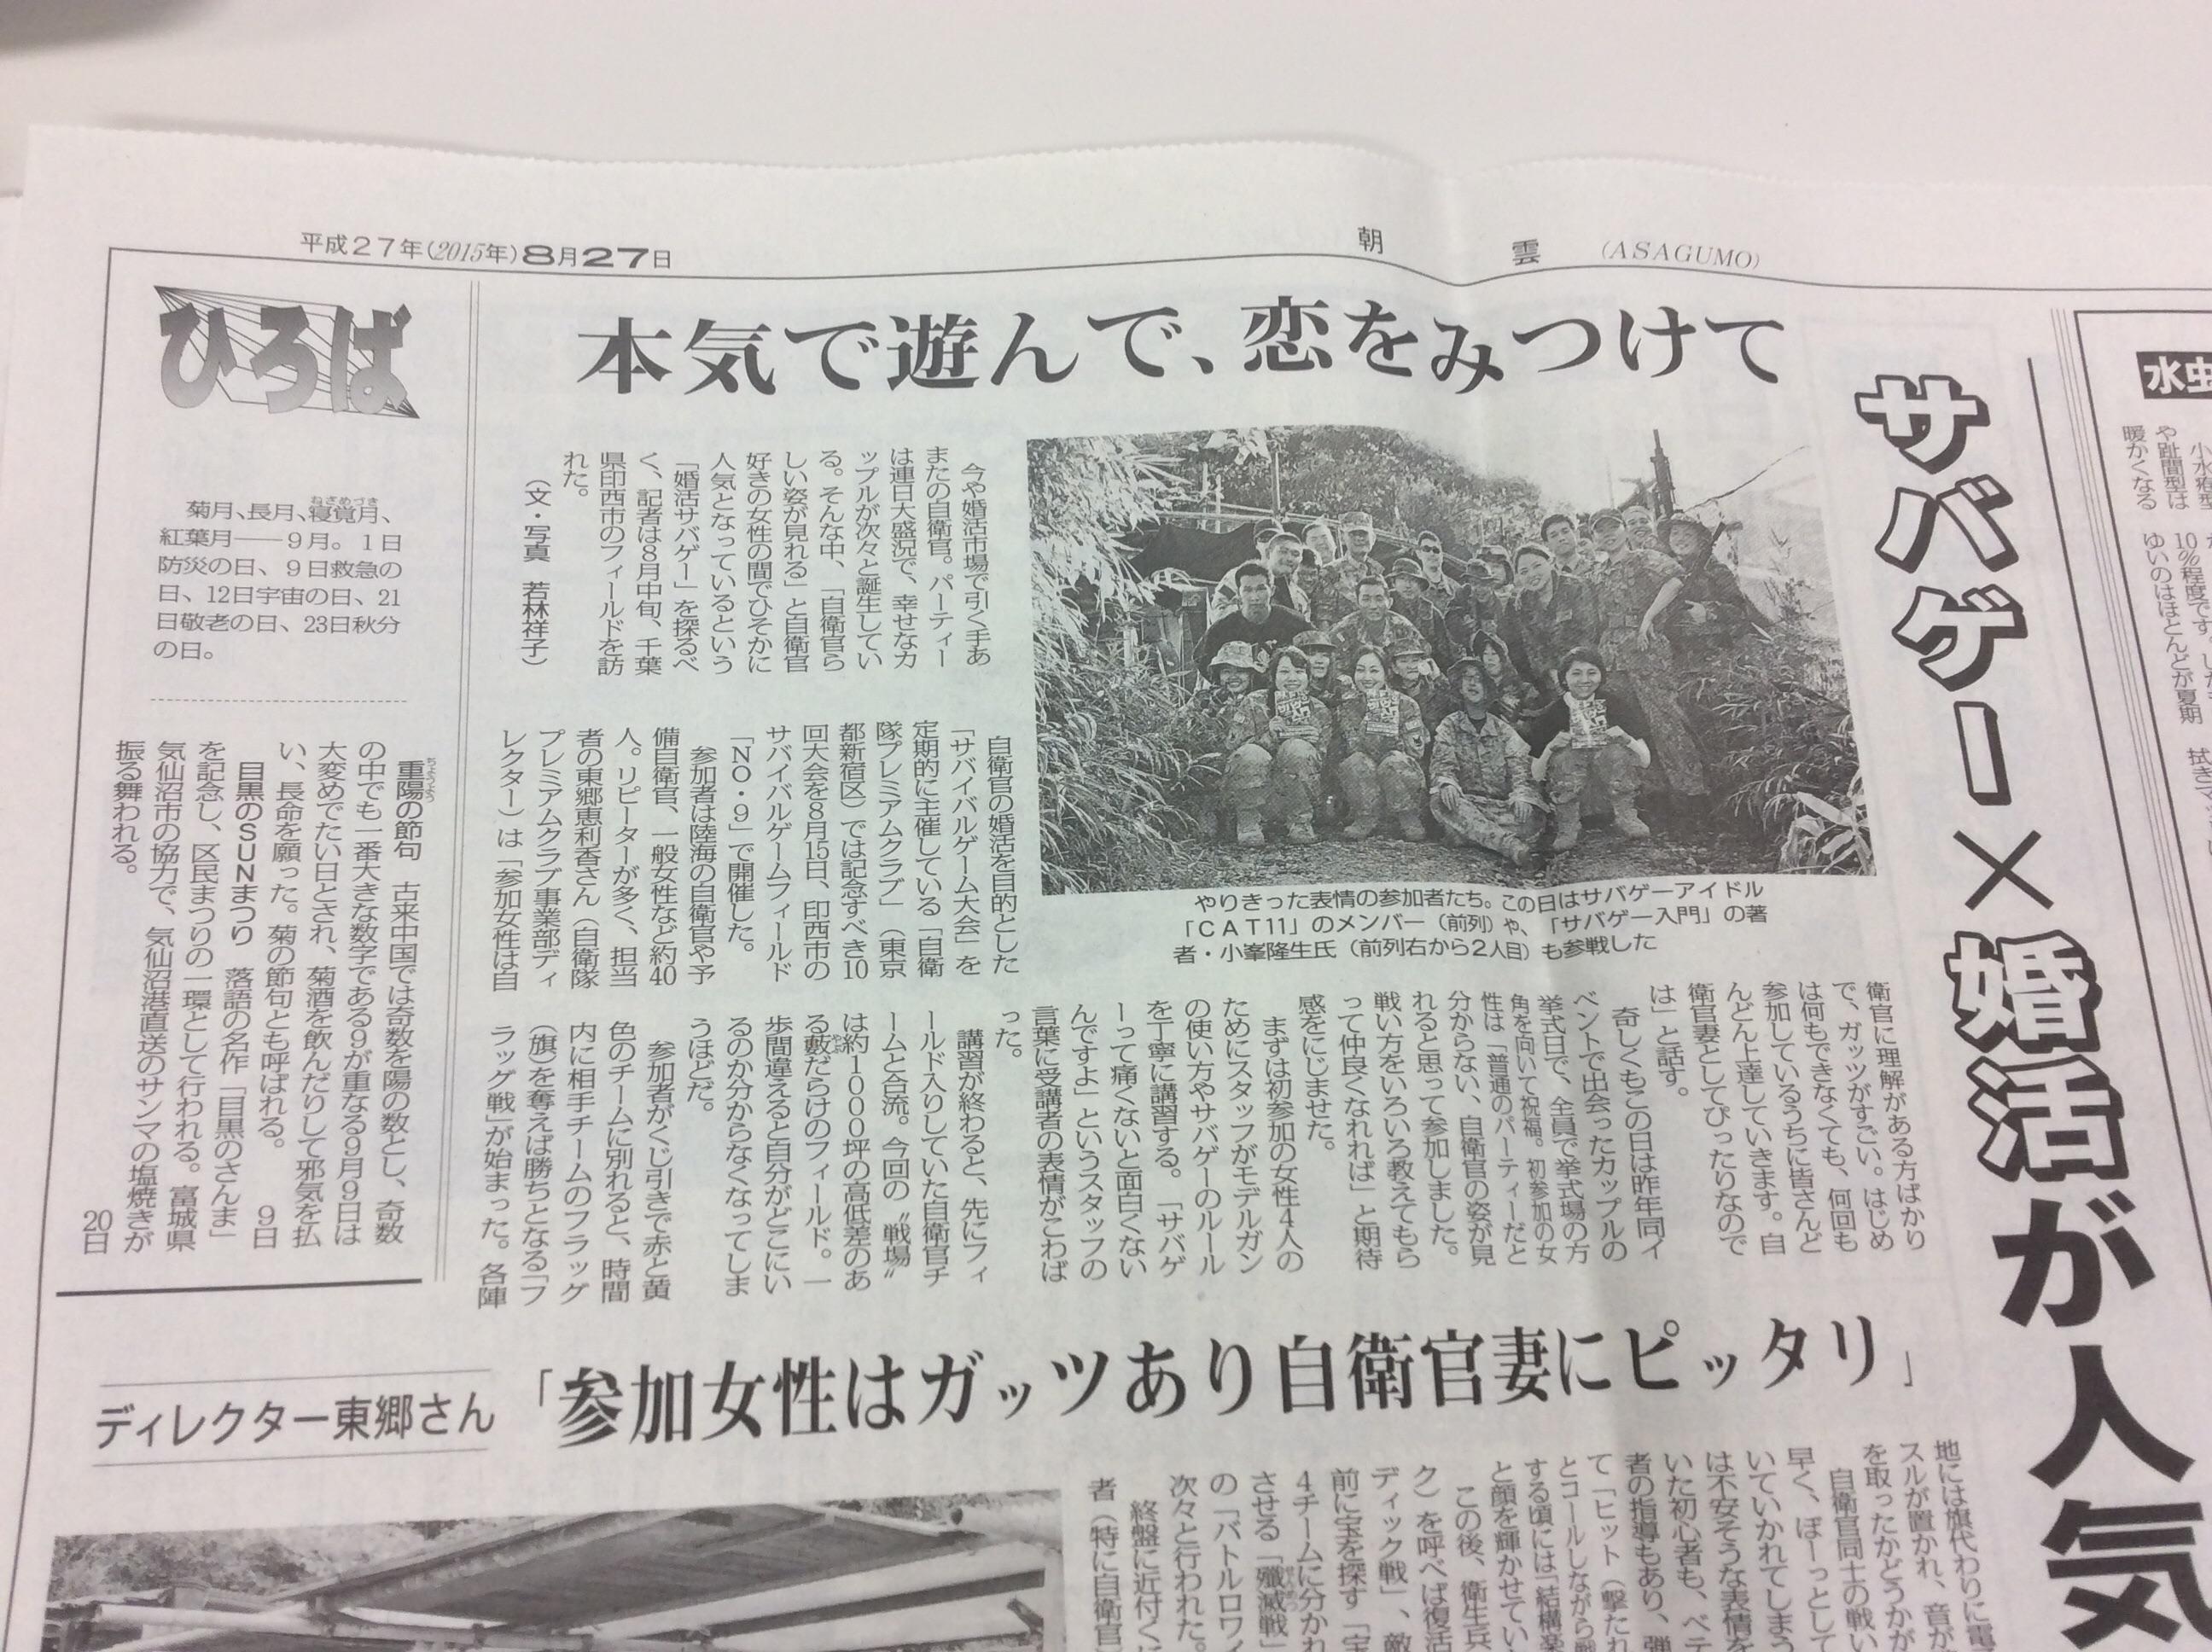 2015/9/10 自衛官・防衛大学生と...